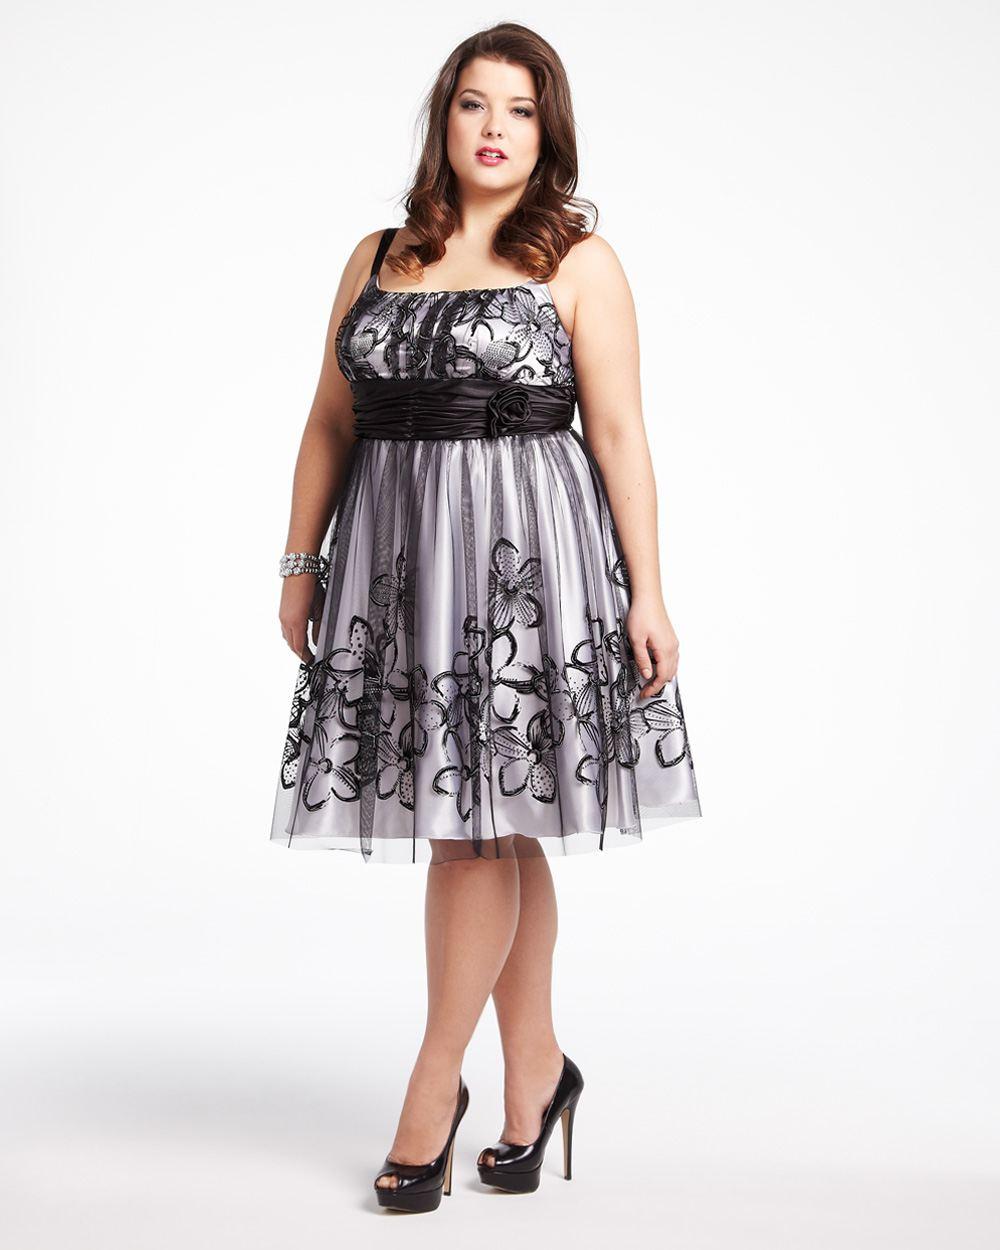 Dresses for plus size women flattering dresses for plus size women AKWRTEY